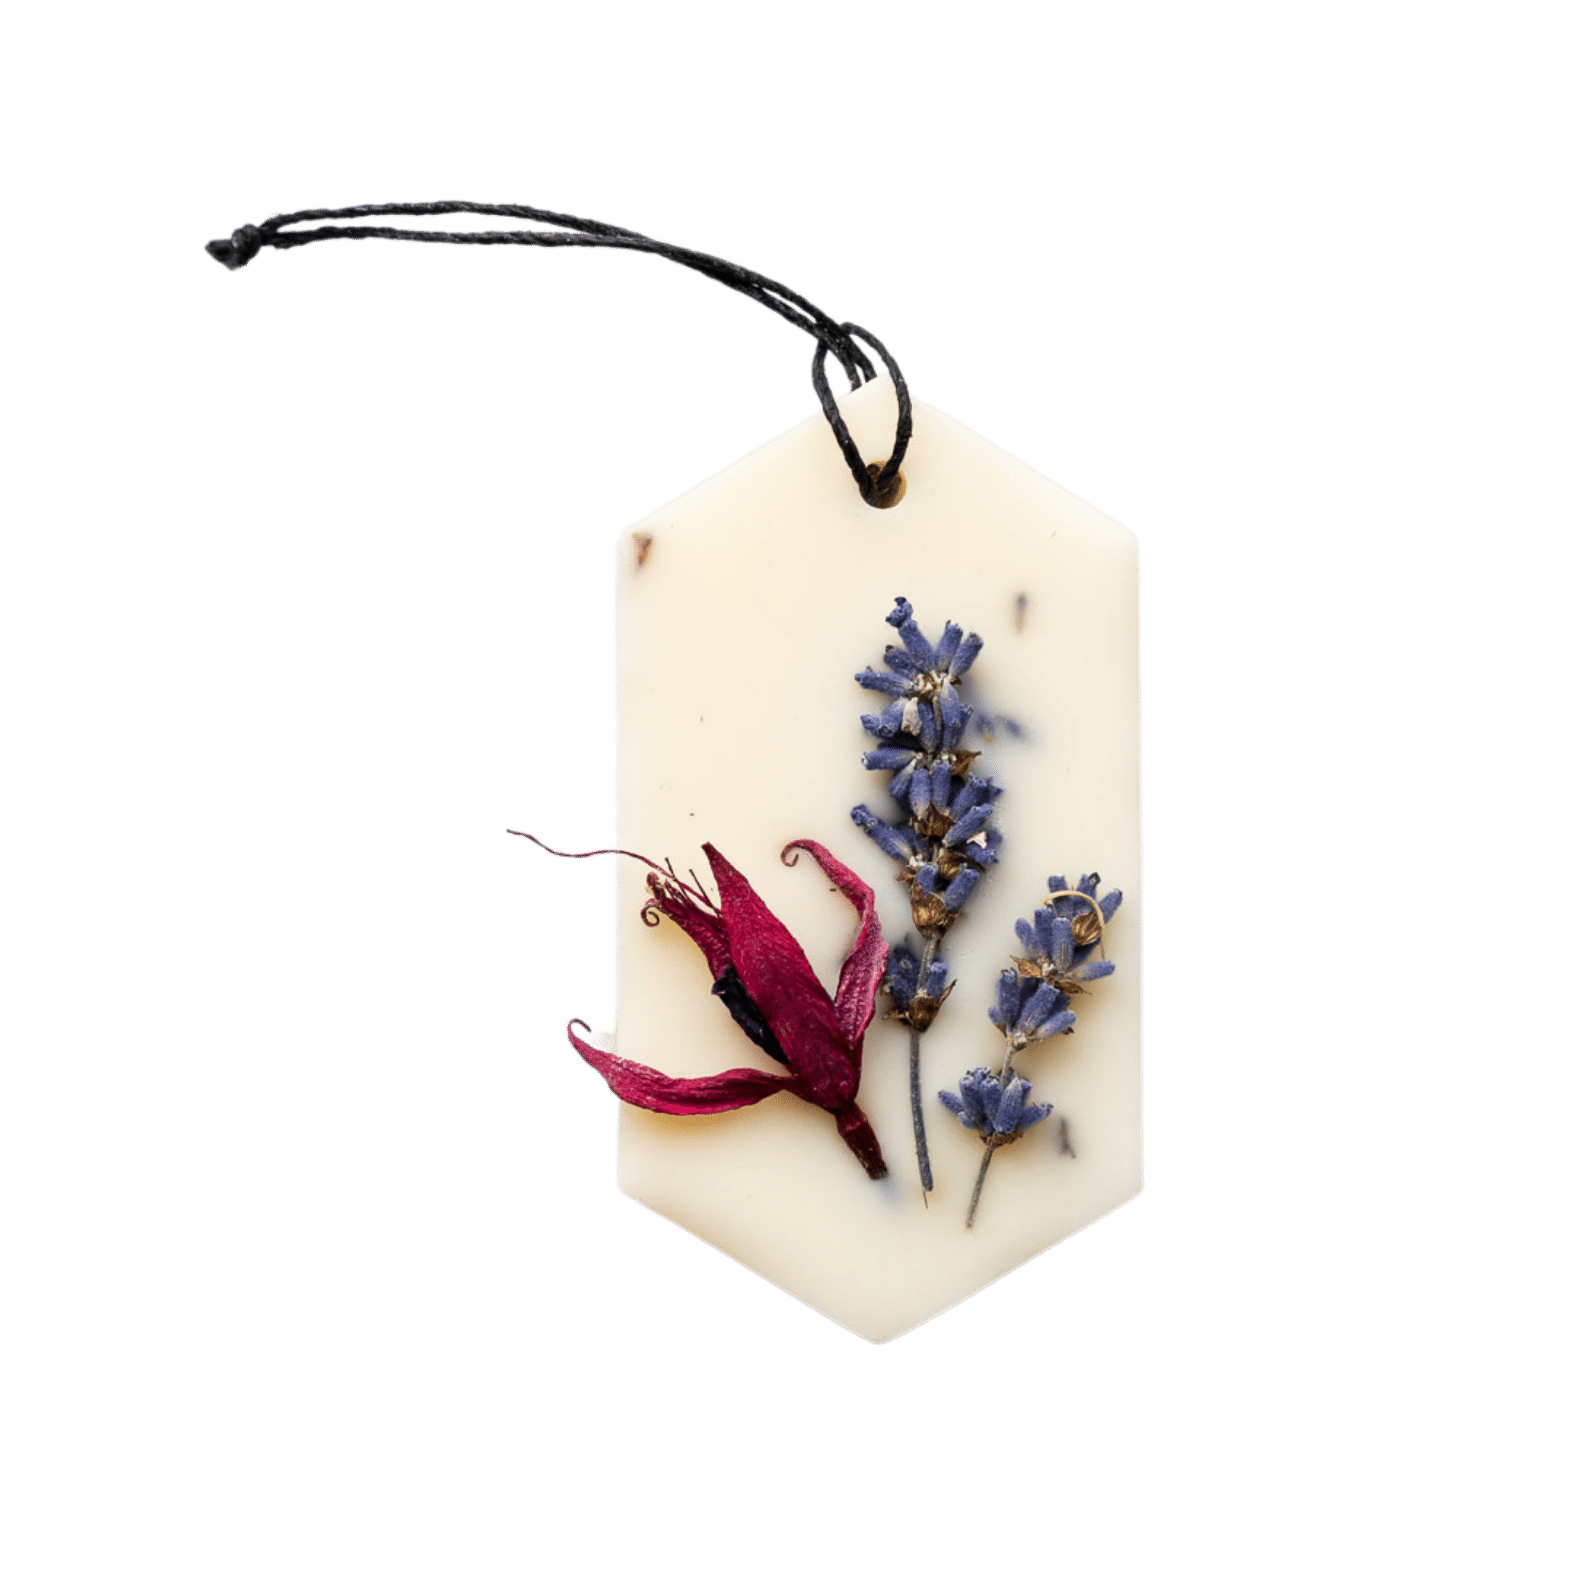 Mythyn - Botanical Scented Wax Tablets - Dusk - Ylang Ylang Lavender Cedarwood